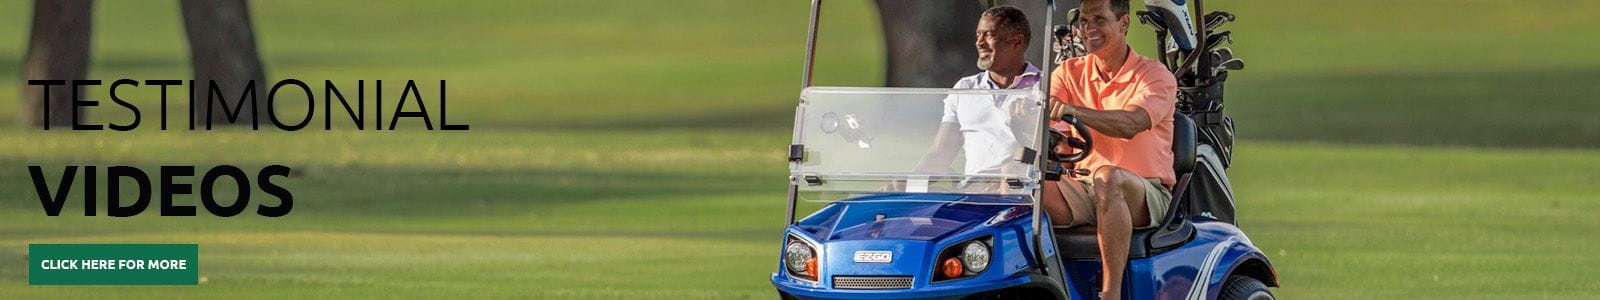 Augusta Golf & Utility Cars Testimonial Videos